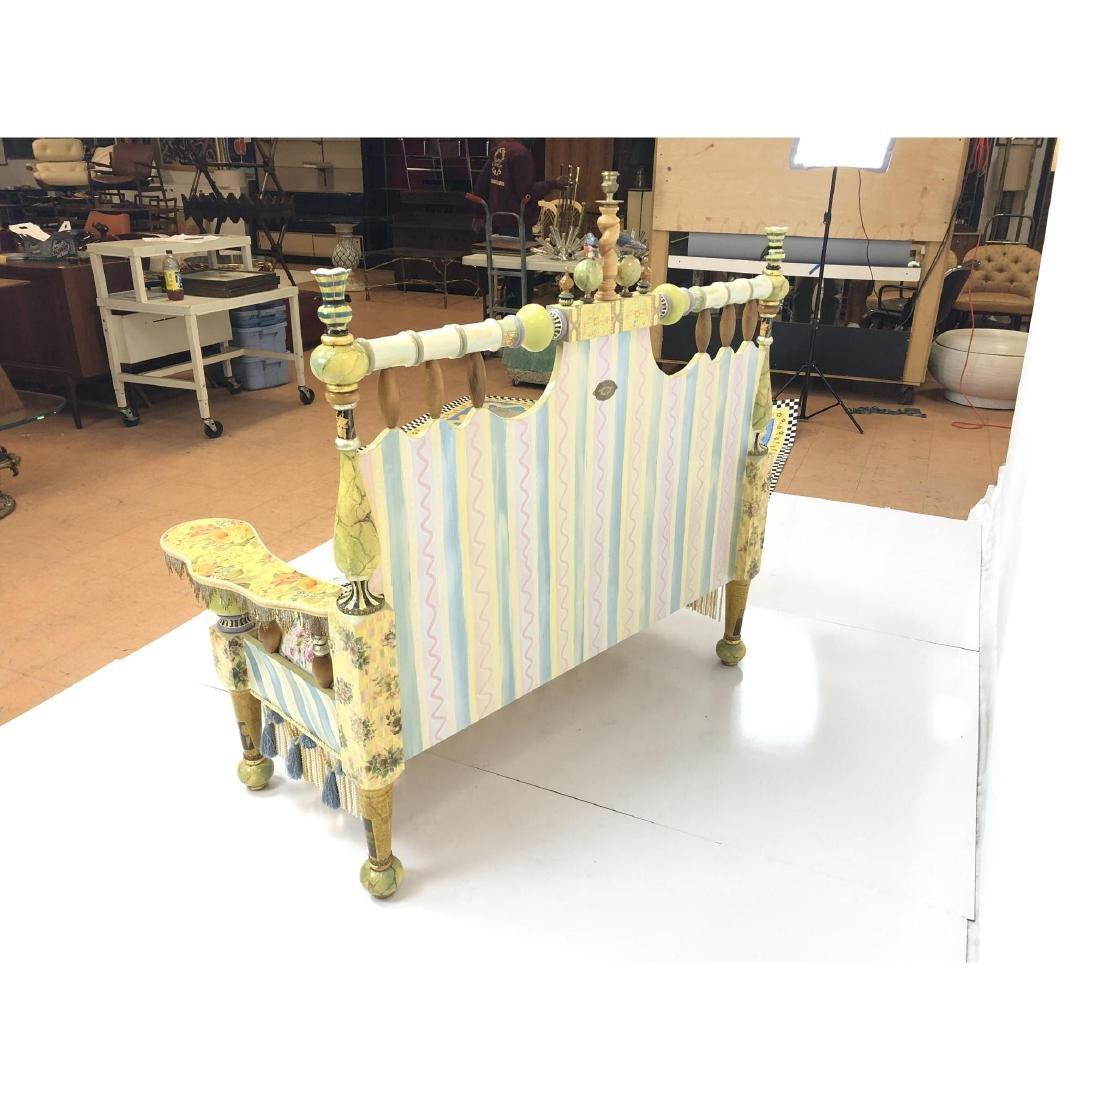 MACKENZIE CHILDS Handmade Painted Settee Couch. E - 6